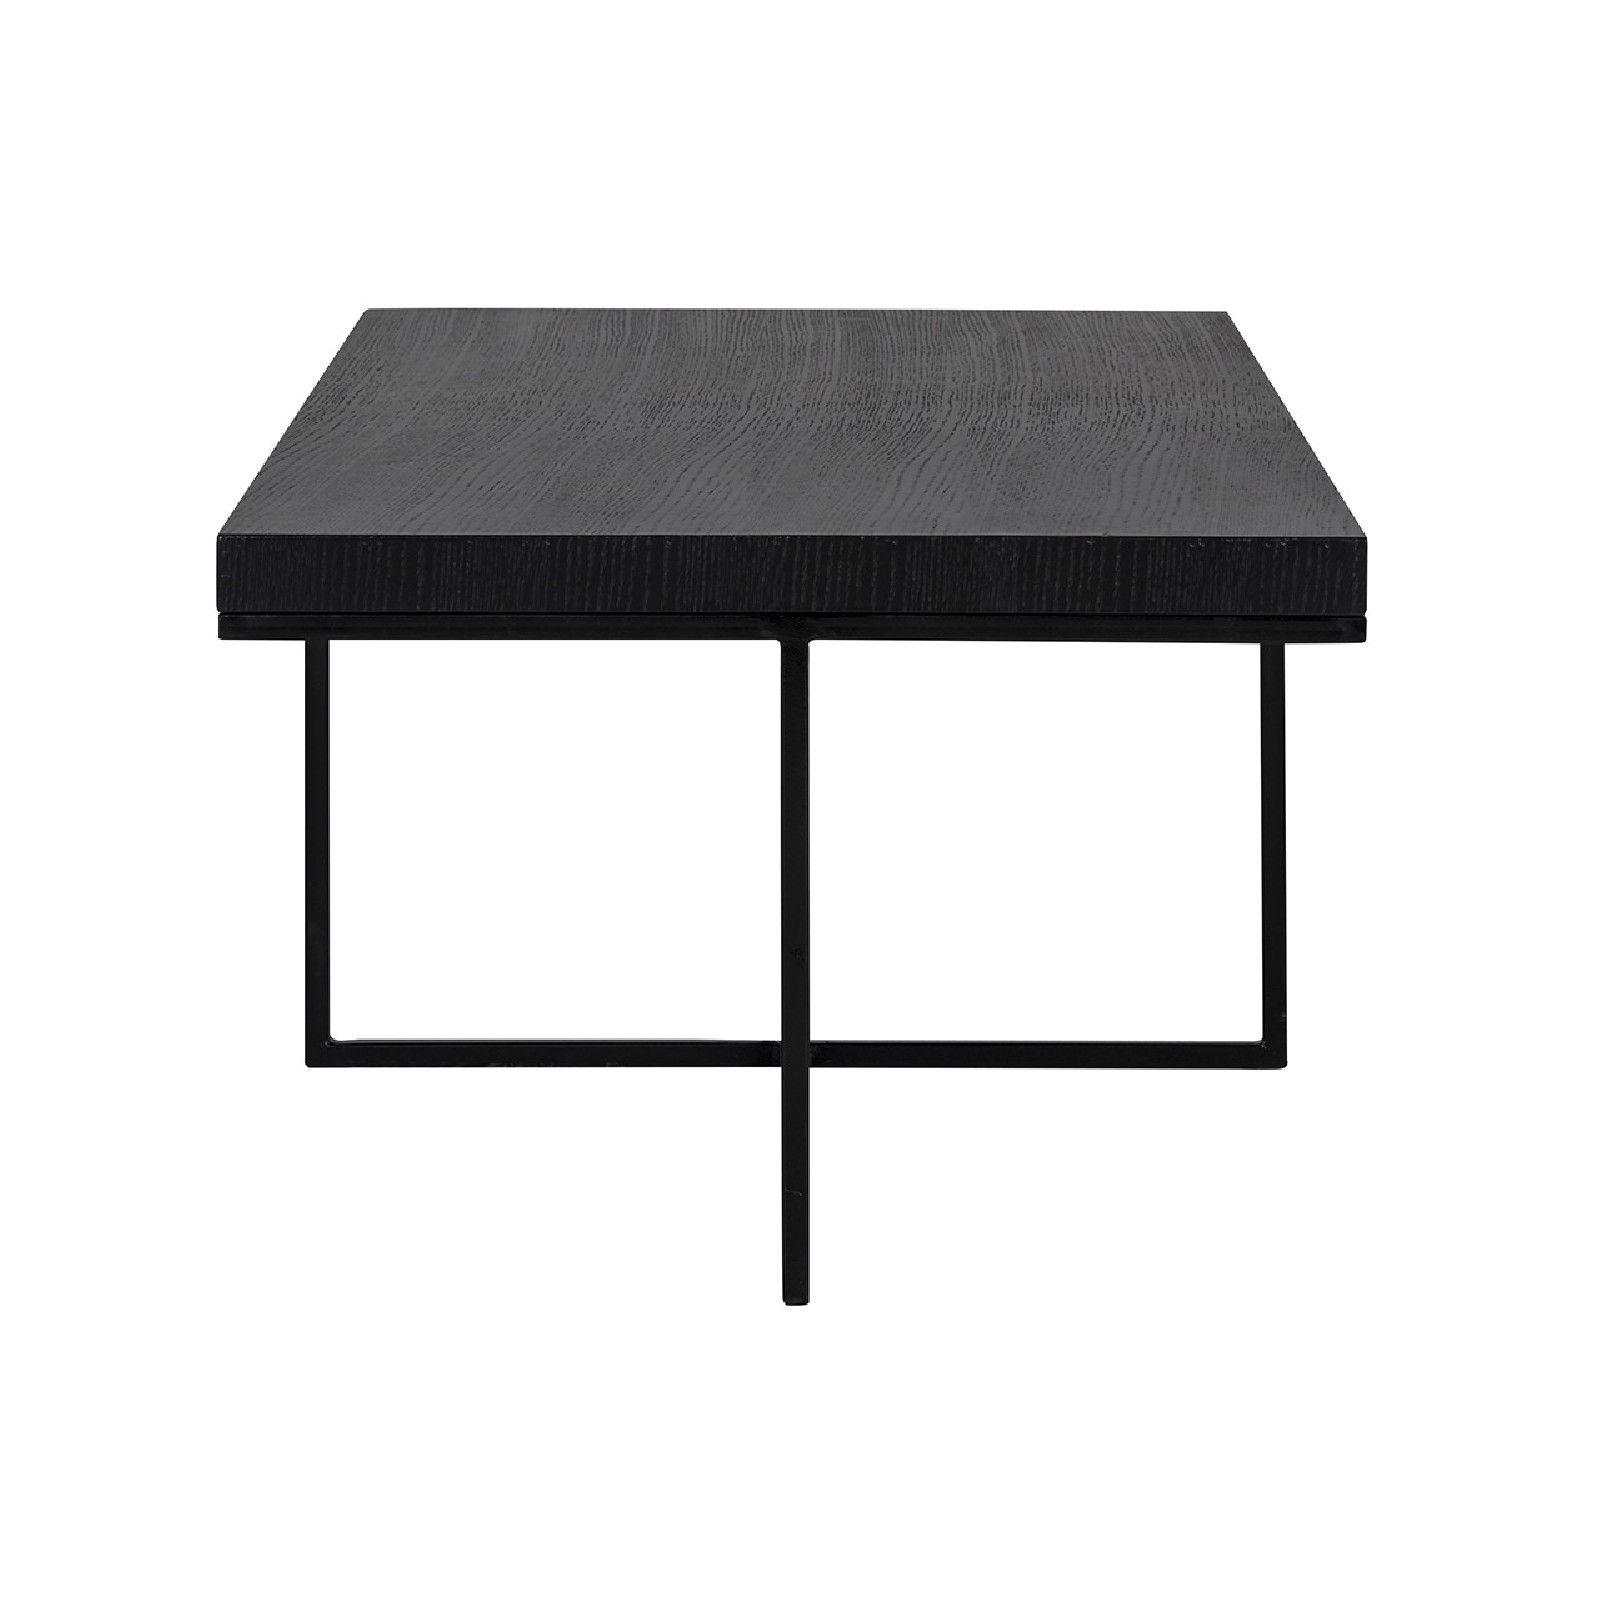 Table basse rectangulaire minimaliste 120x60